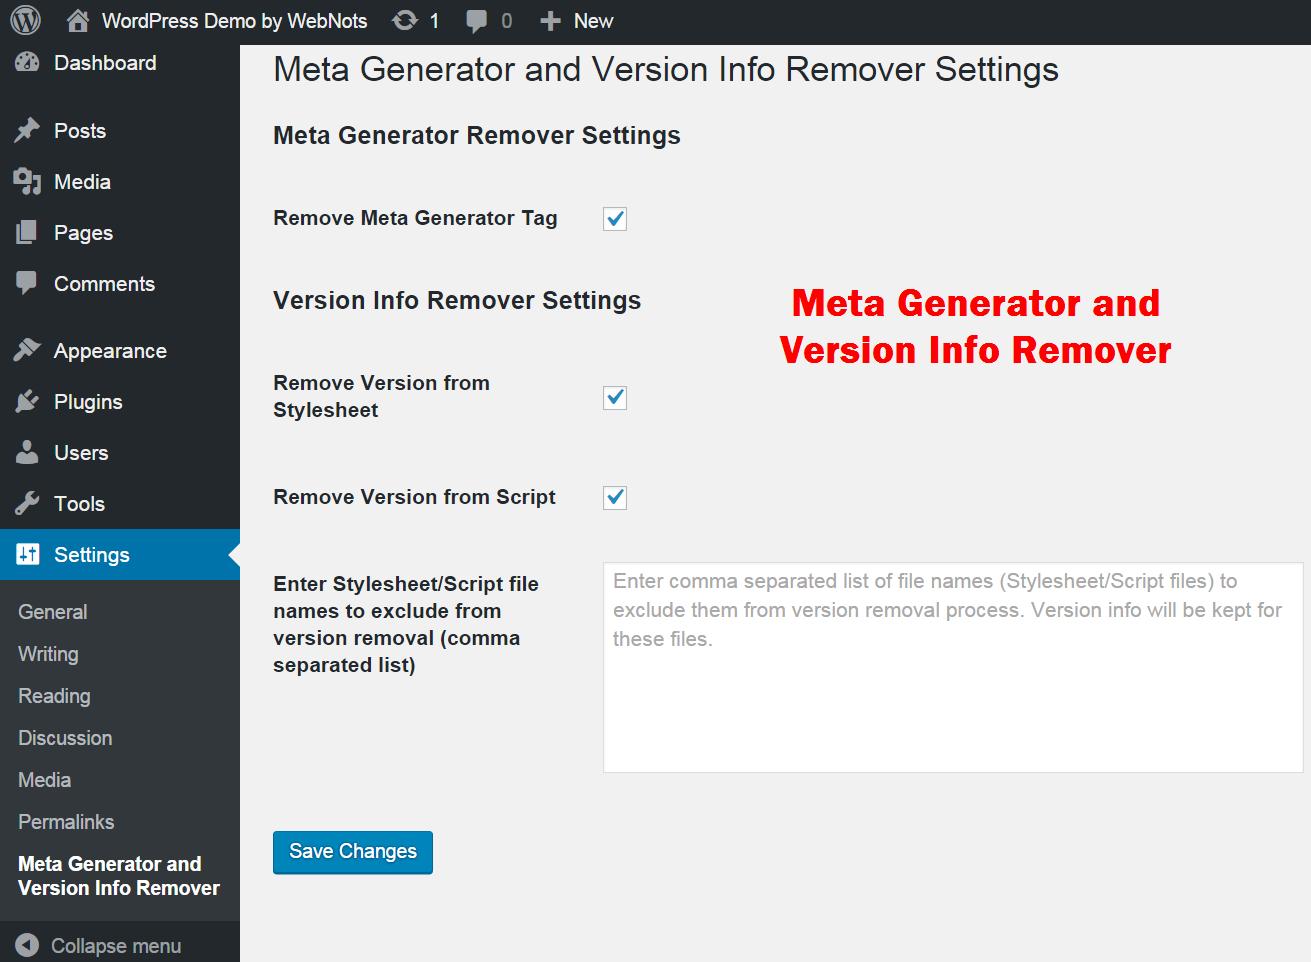 Meta Generator and Version Info Remover